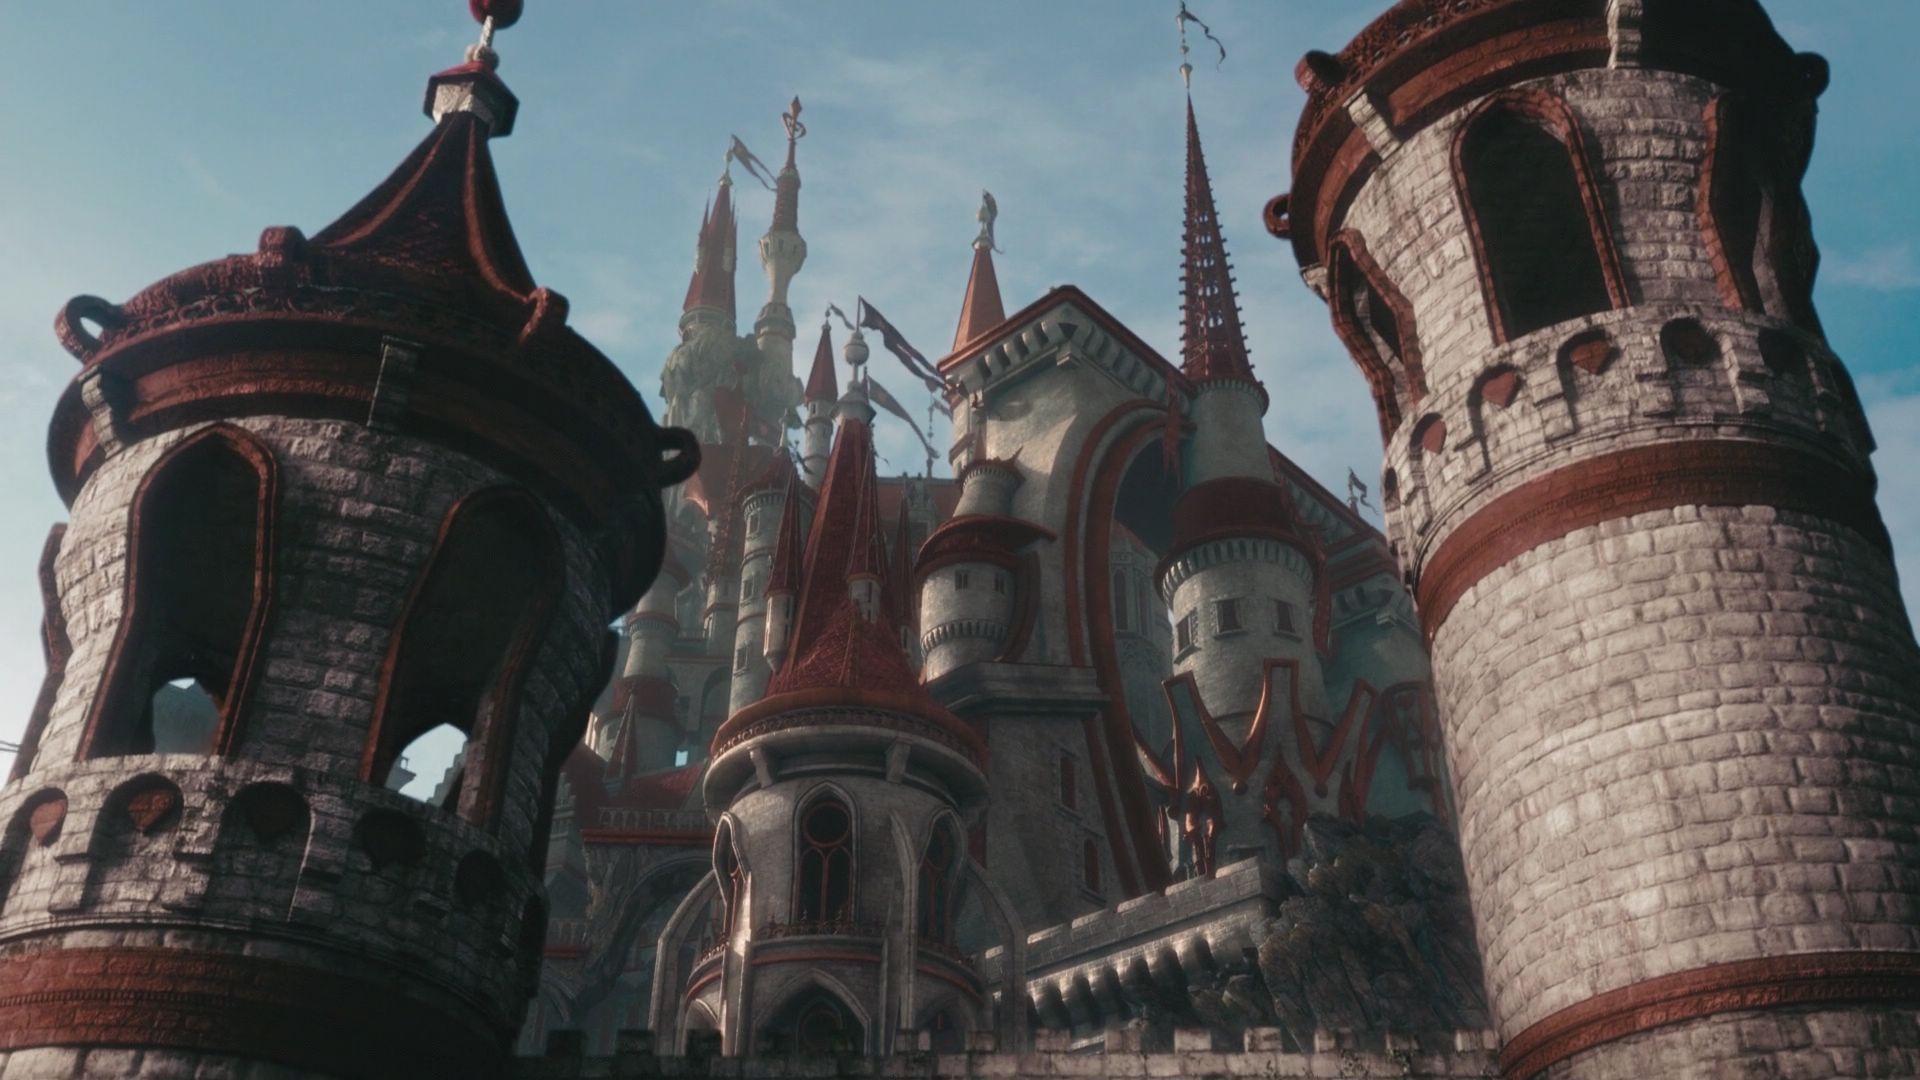 Alice In Wonderland - Red Queen Castle Detail Disney